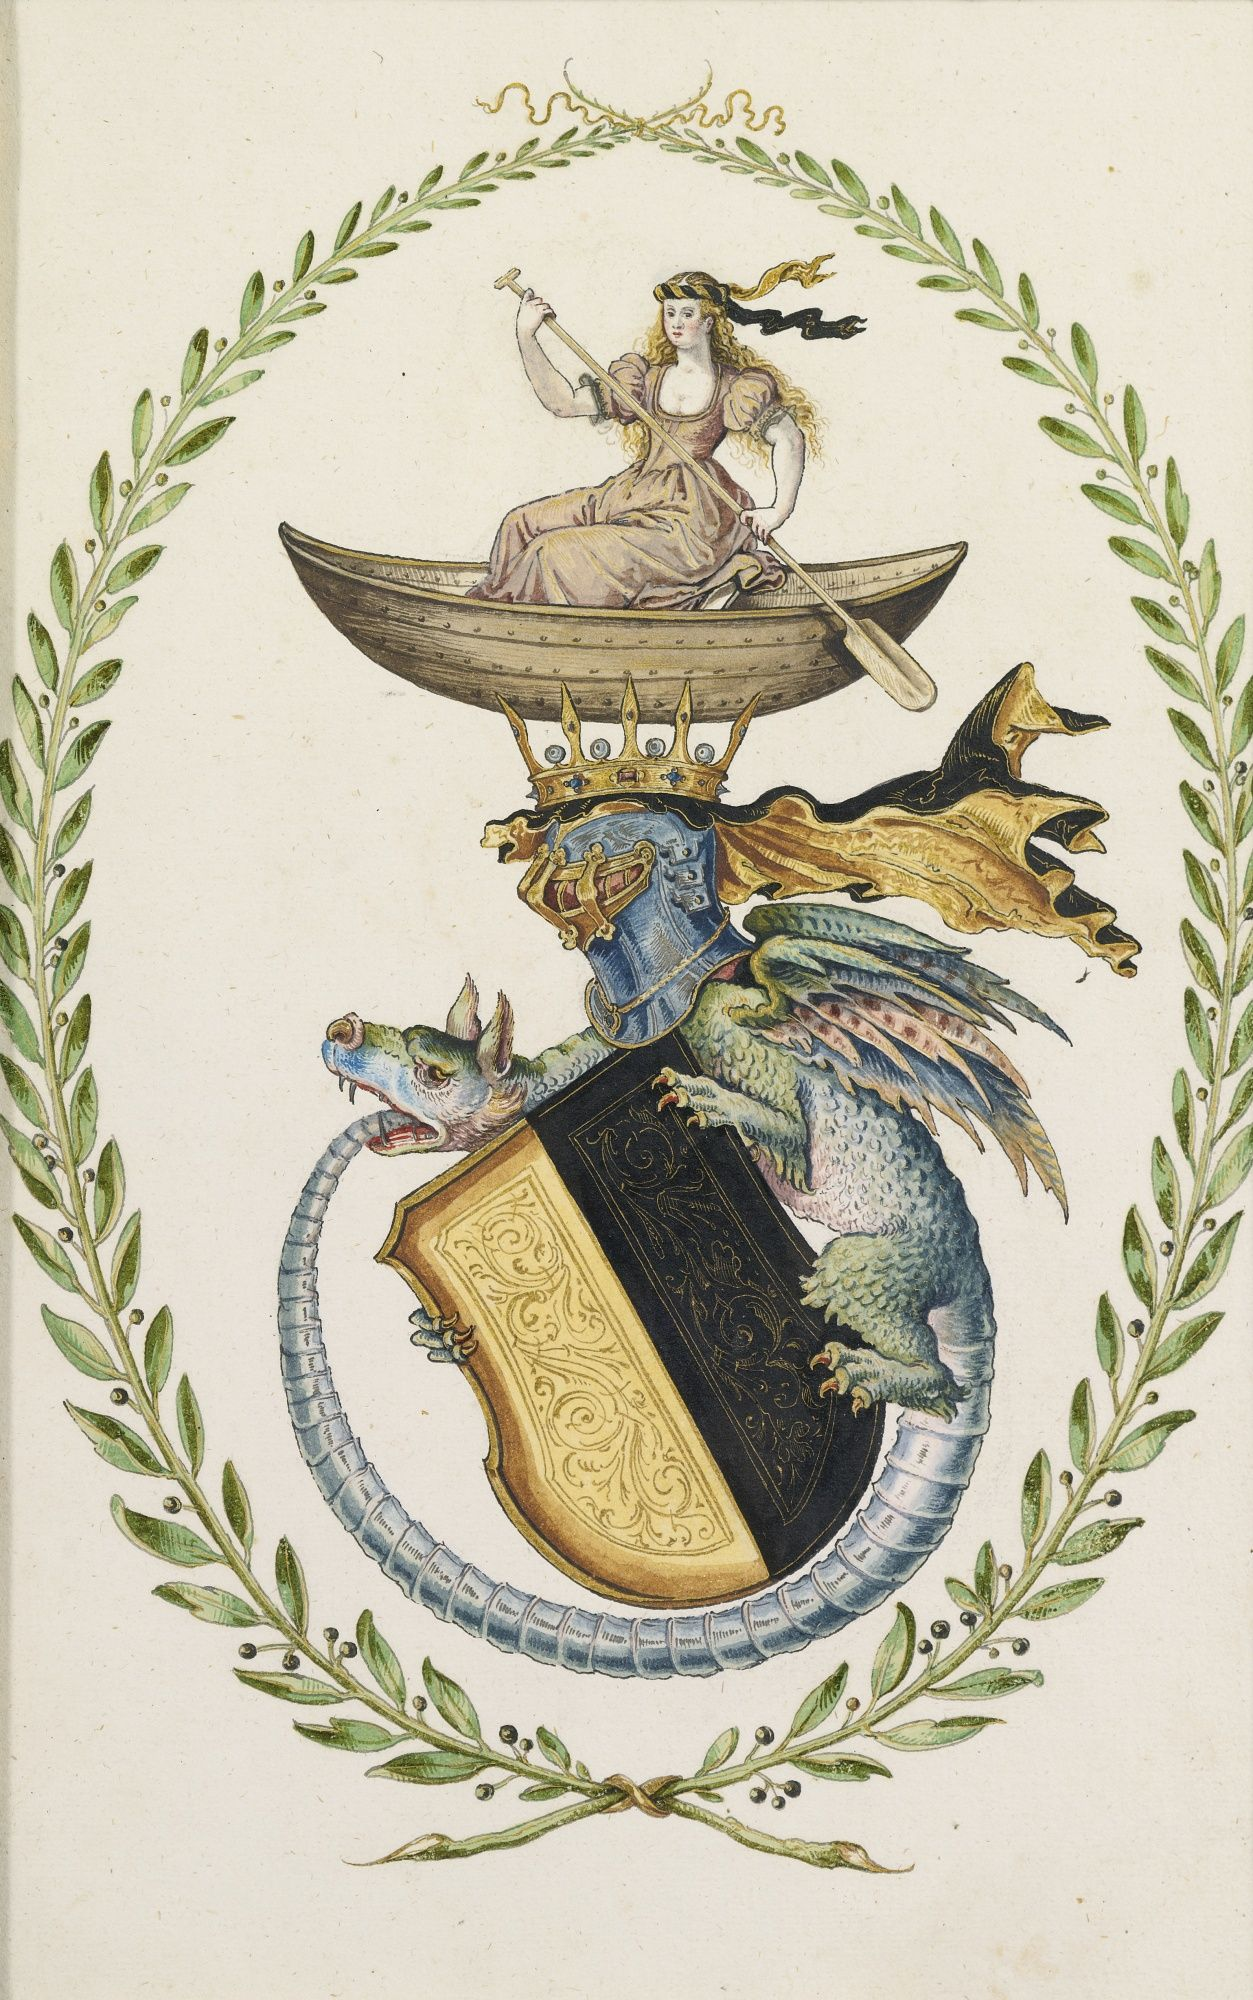 german school 17th century design for coat of arms